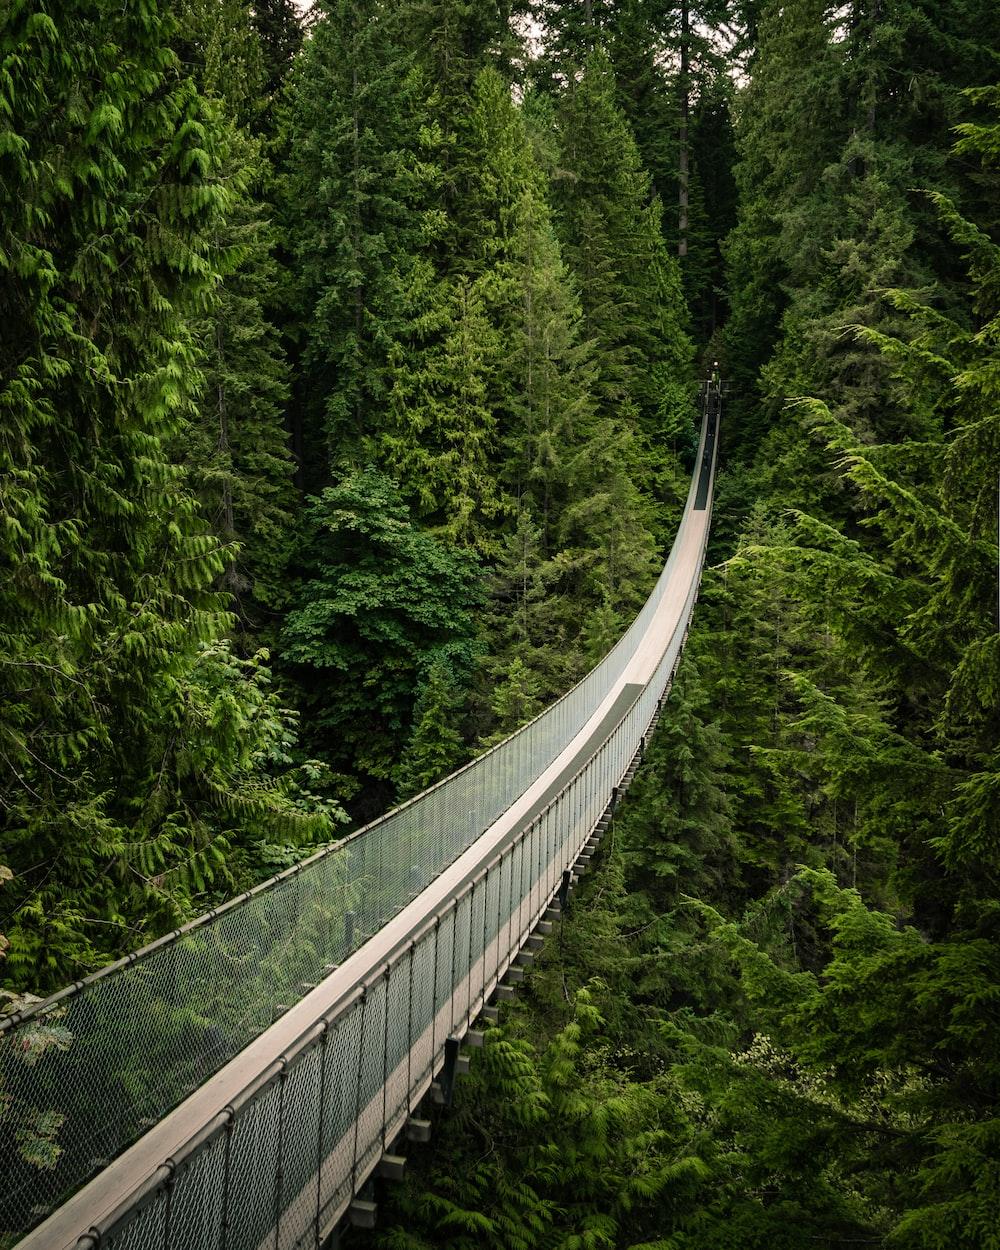 trees between bridge during daytime